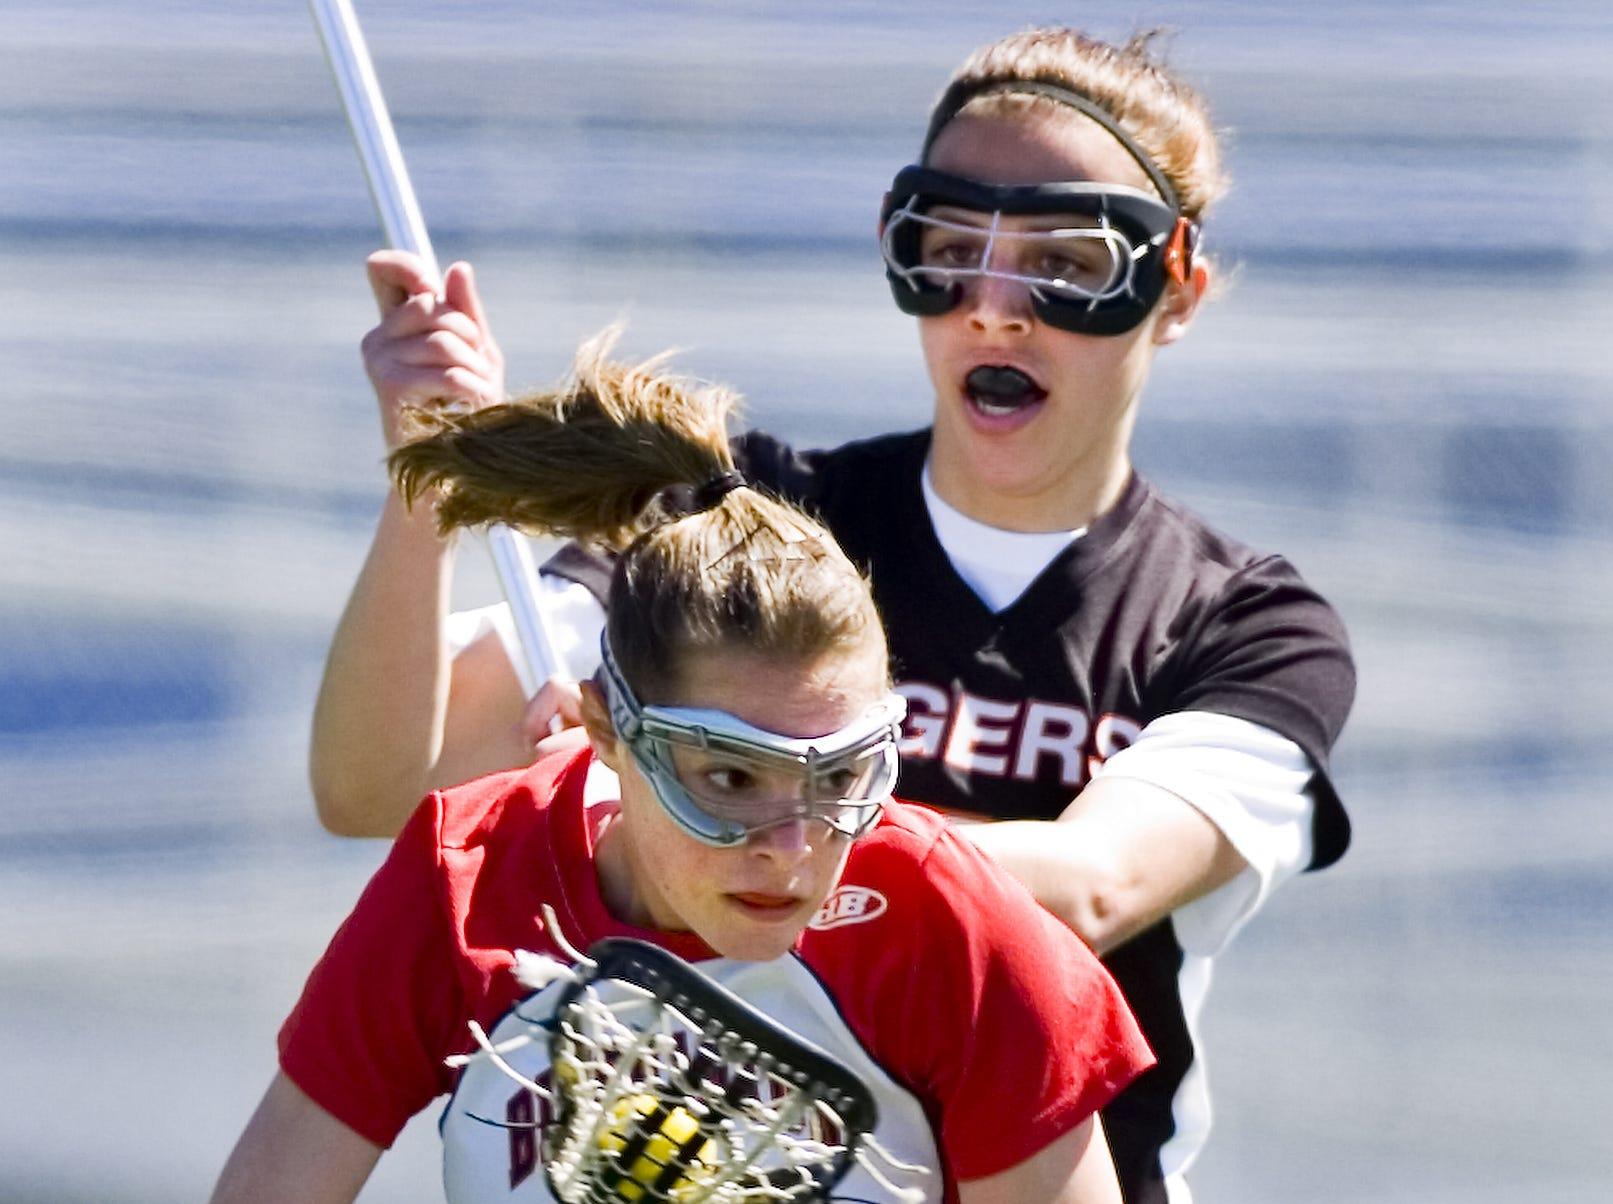 2007: Union-Endicott's Adrianna Gaeta closes in on Binghamton's Melissa Peterson during their STAC lacrosse match on Wednesday. Binghamton won, 16-13.